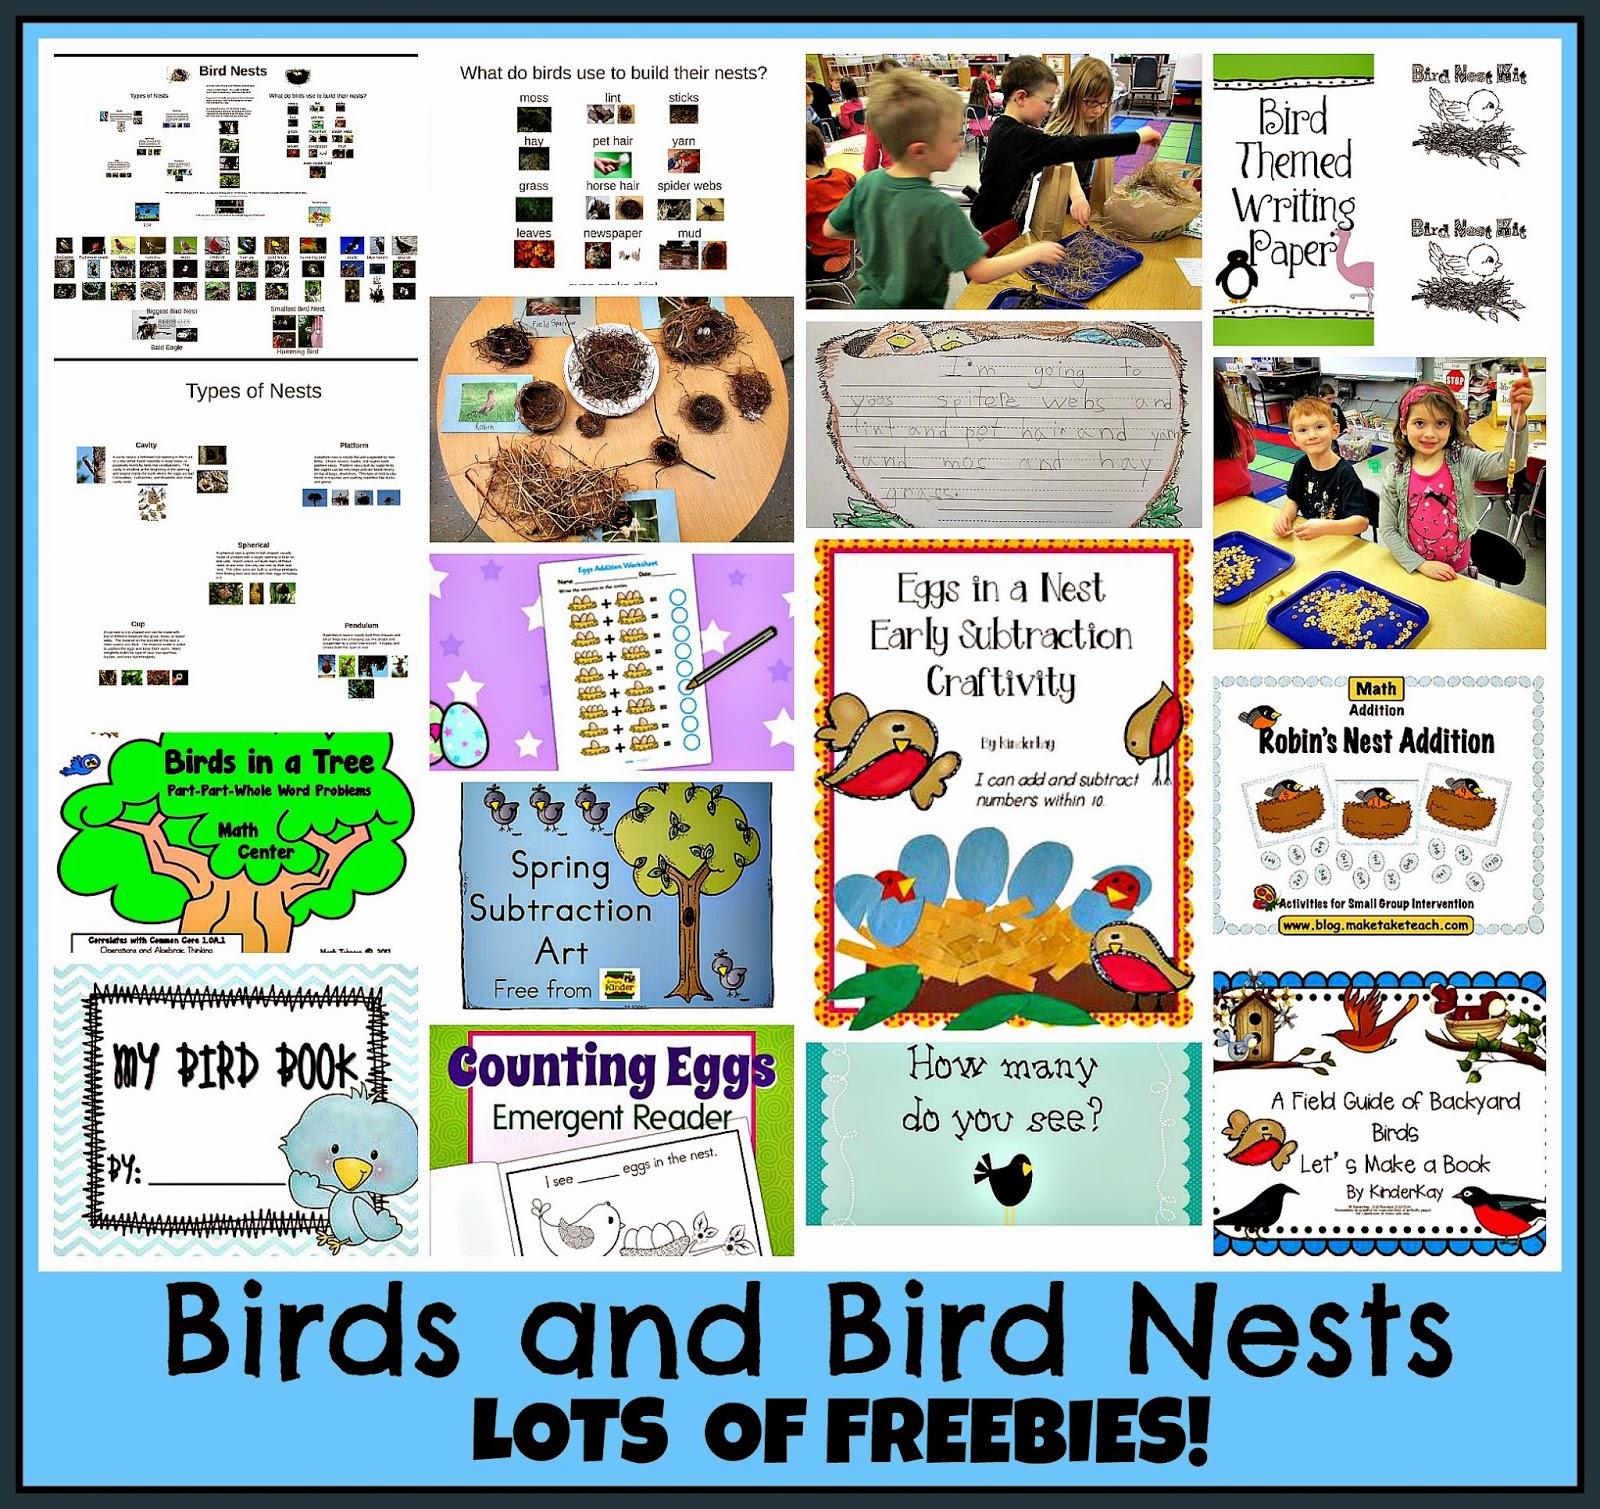 http://ckisloski.blogspot.com/2014/03/bird-nests-and-birds.html